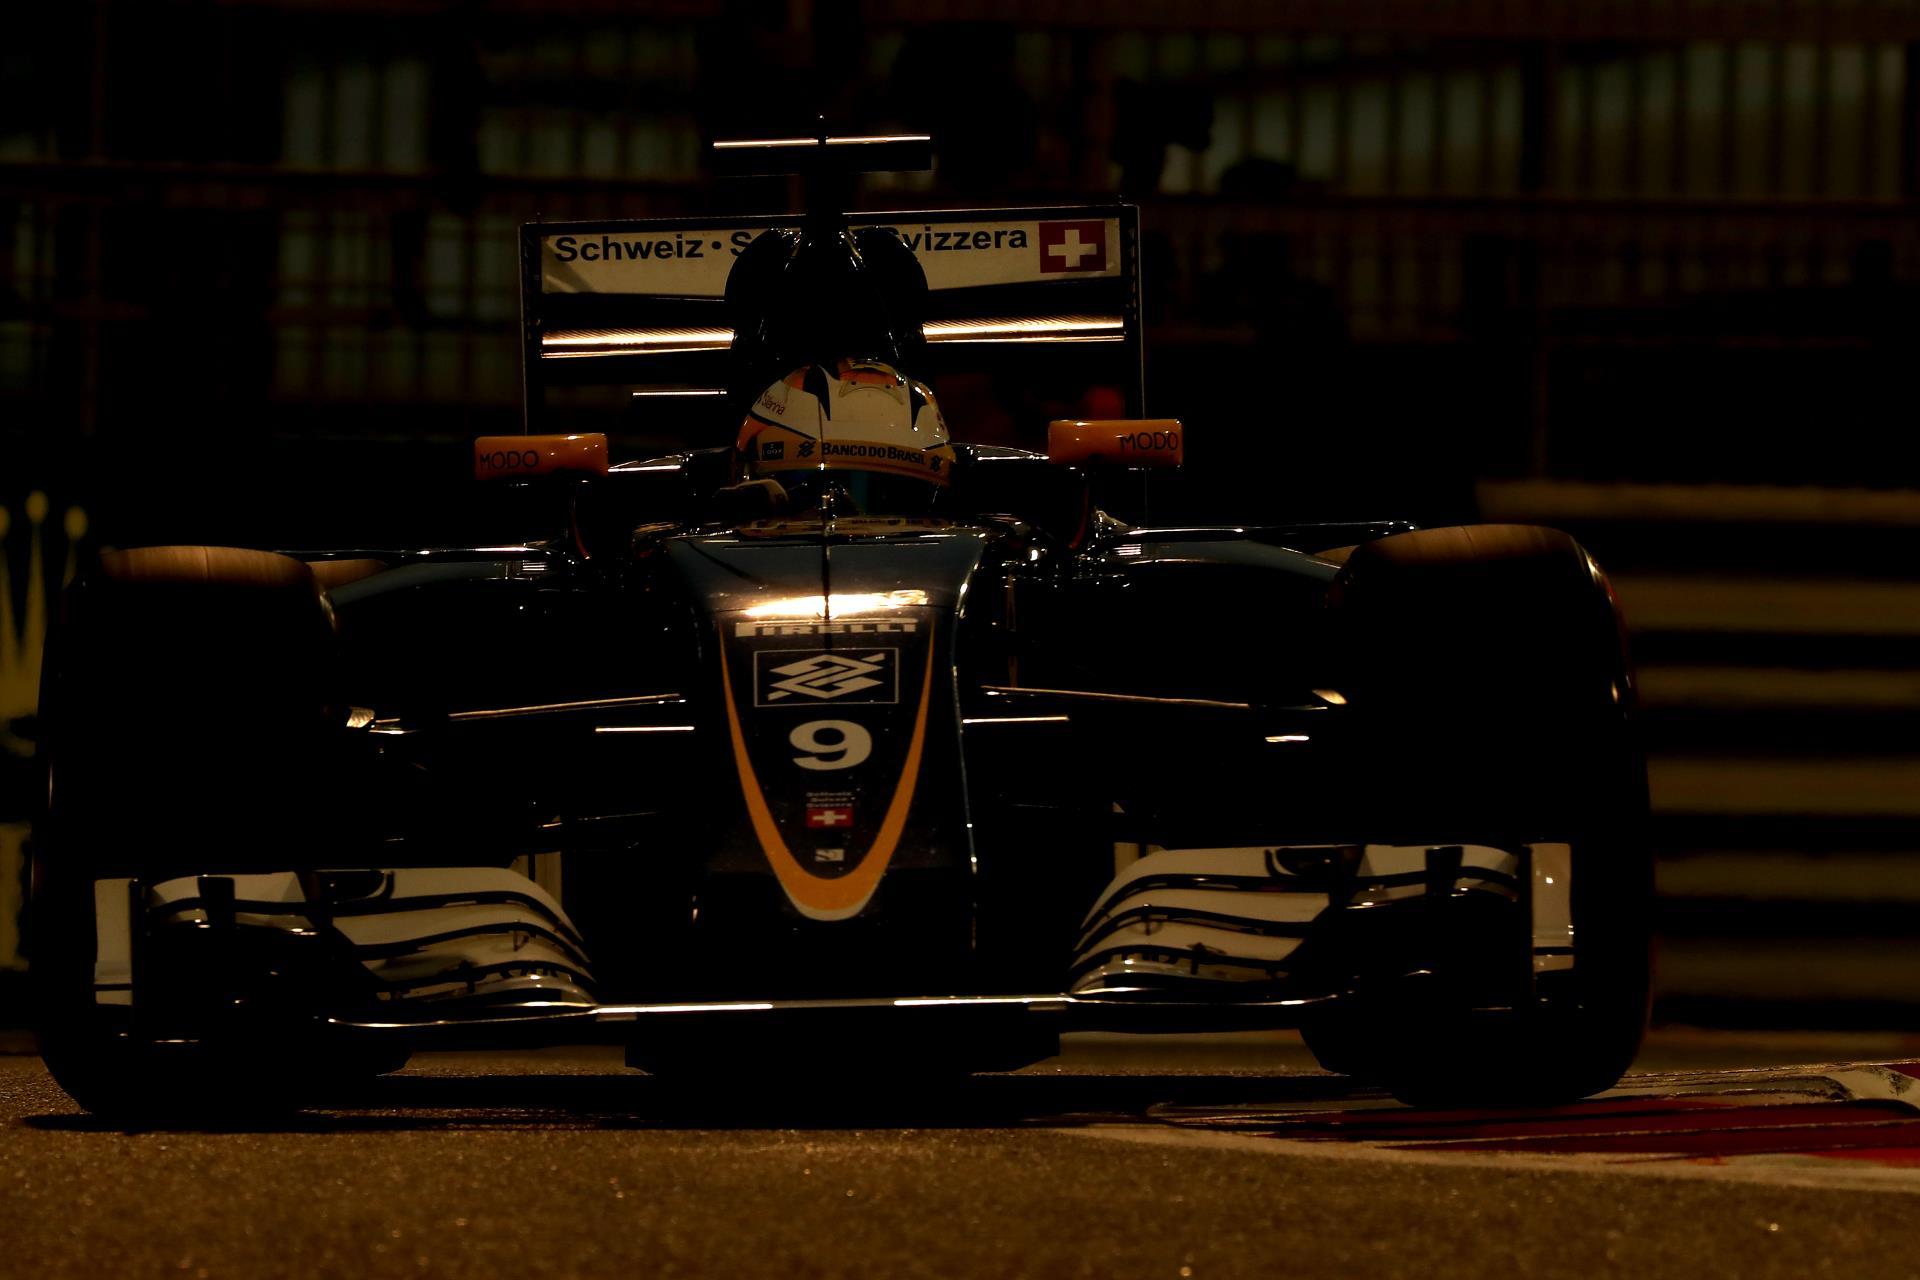 Sauber-C35-Abu-Dhabi-F1-2016-dusk-Foto-Sauber.